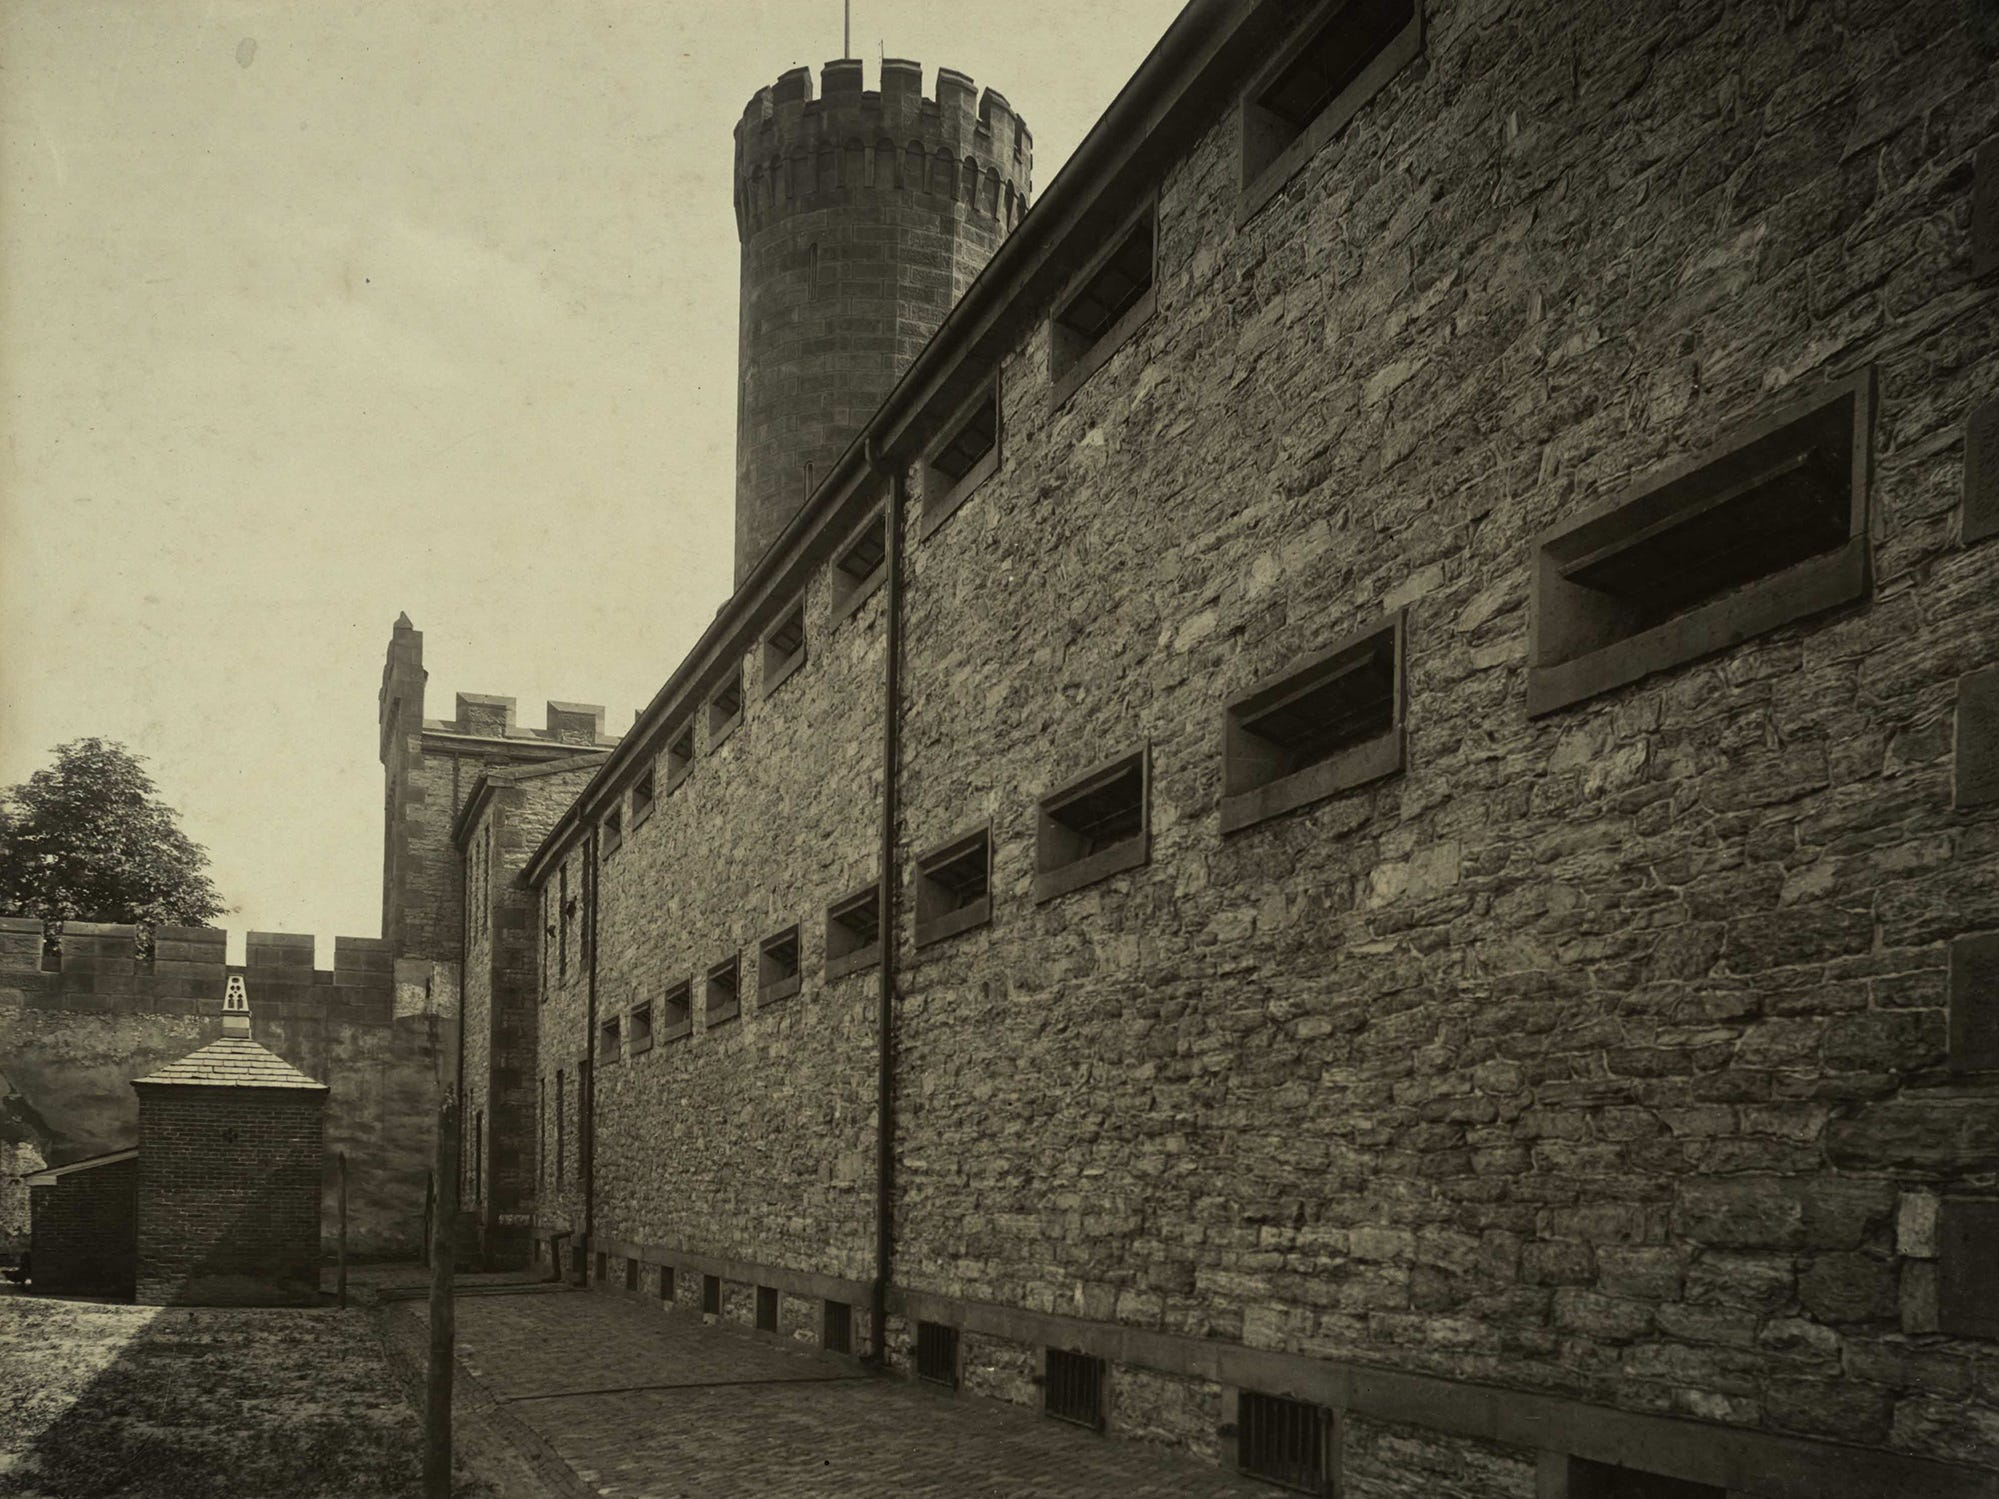 York County Prison 1958. photo courtesy of York County History Center